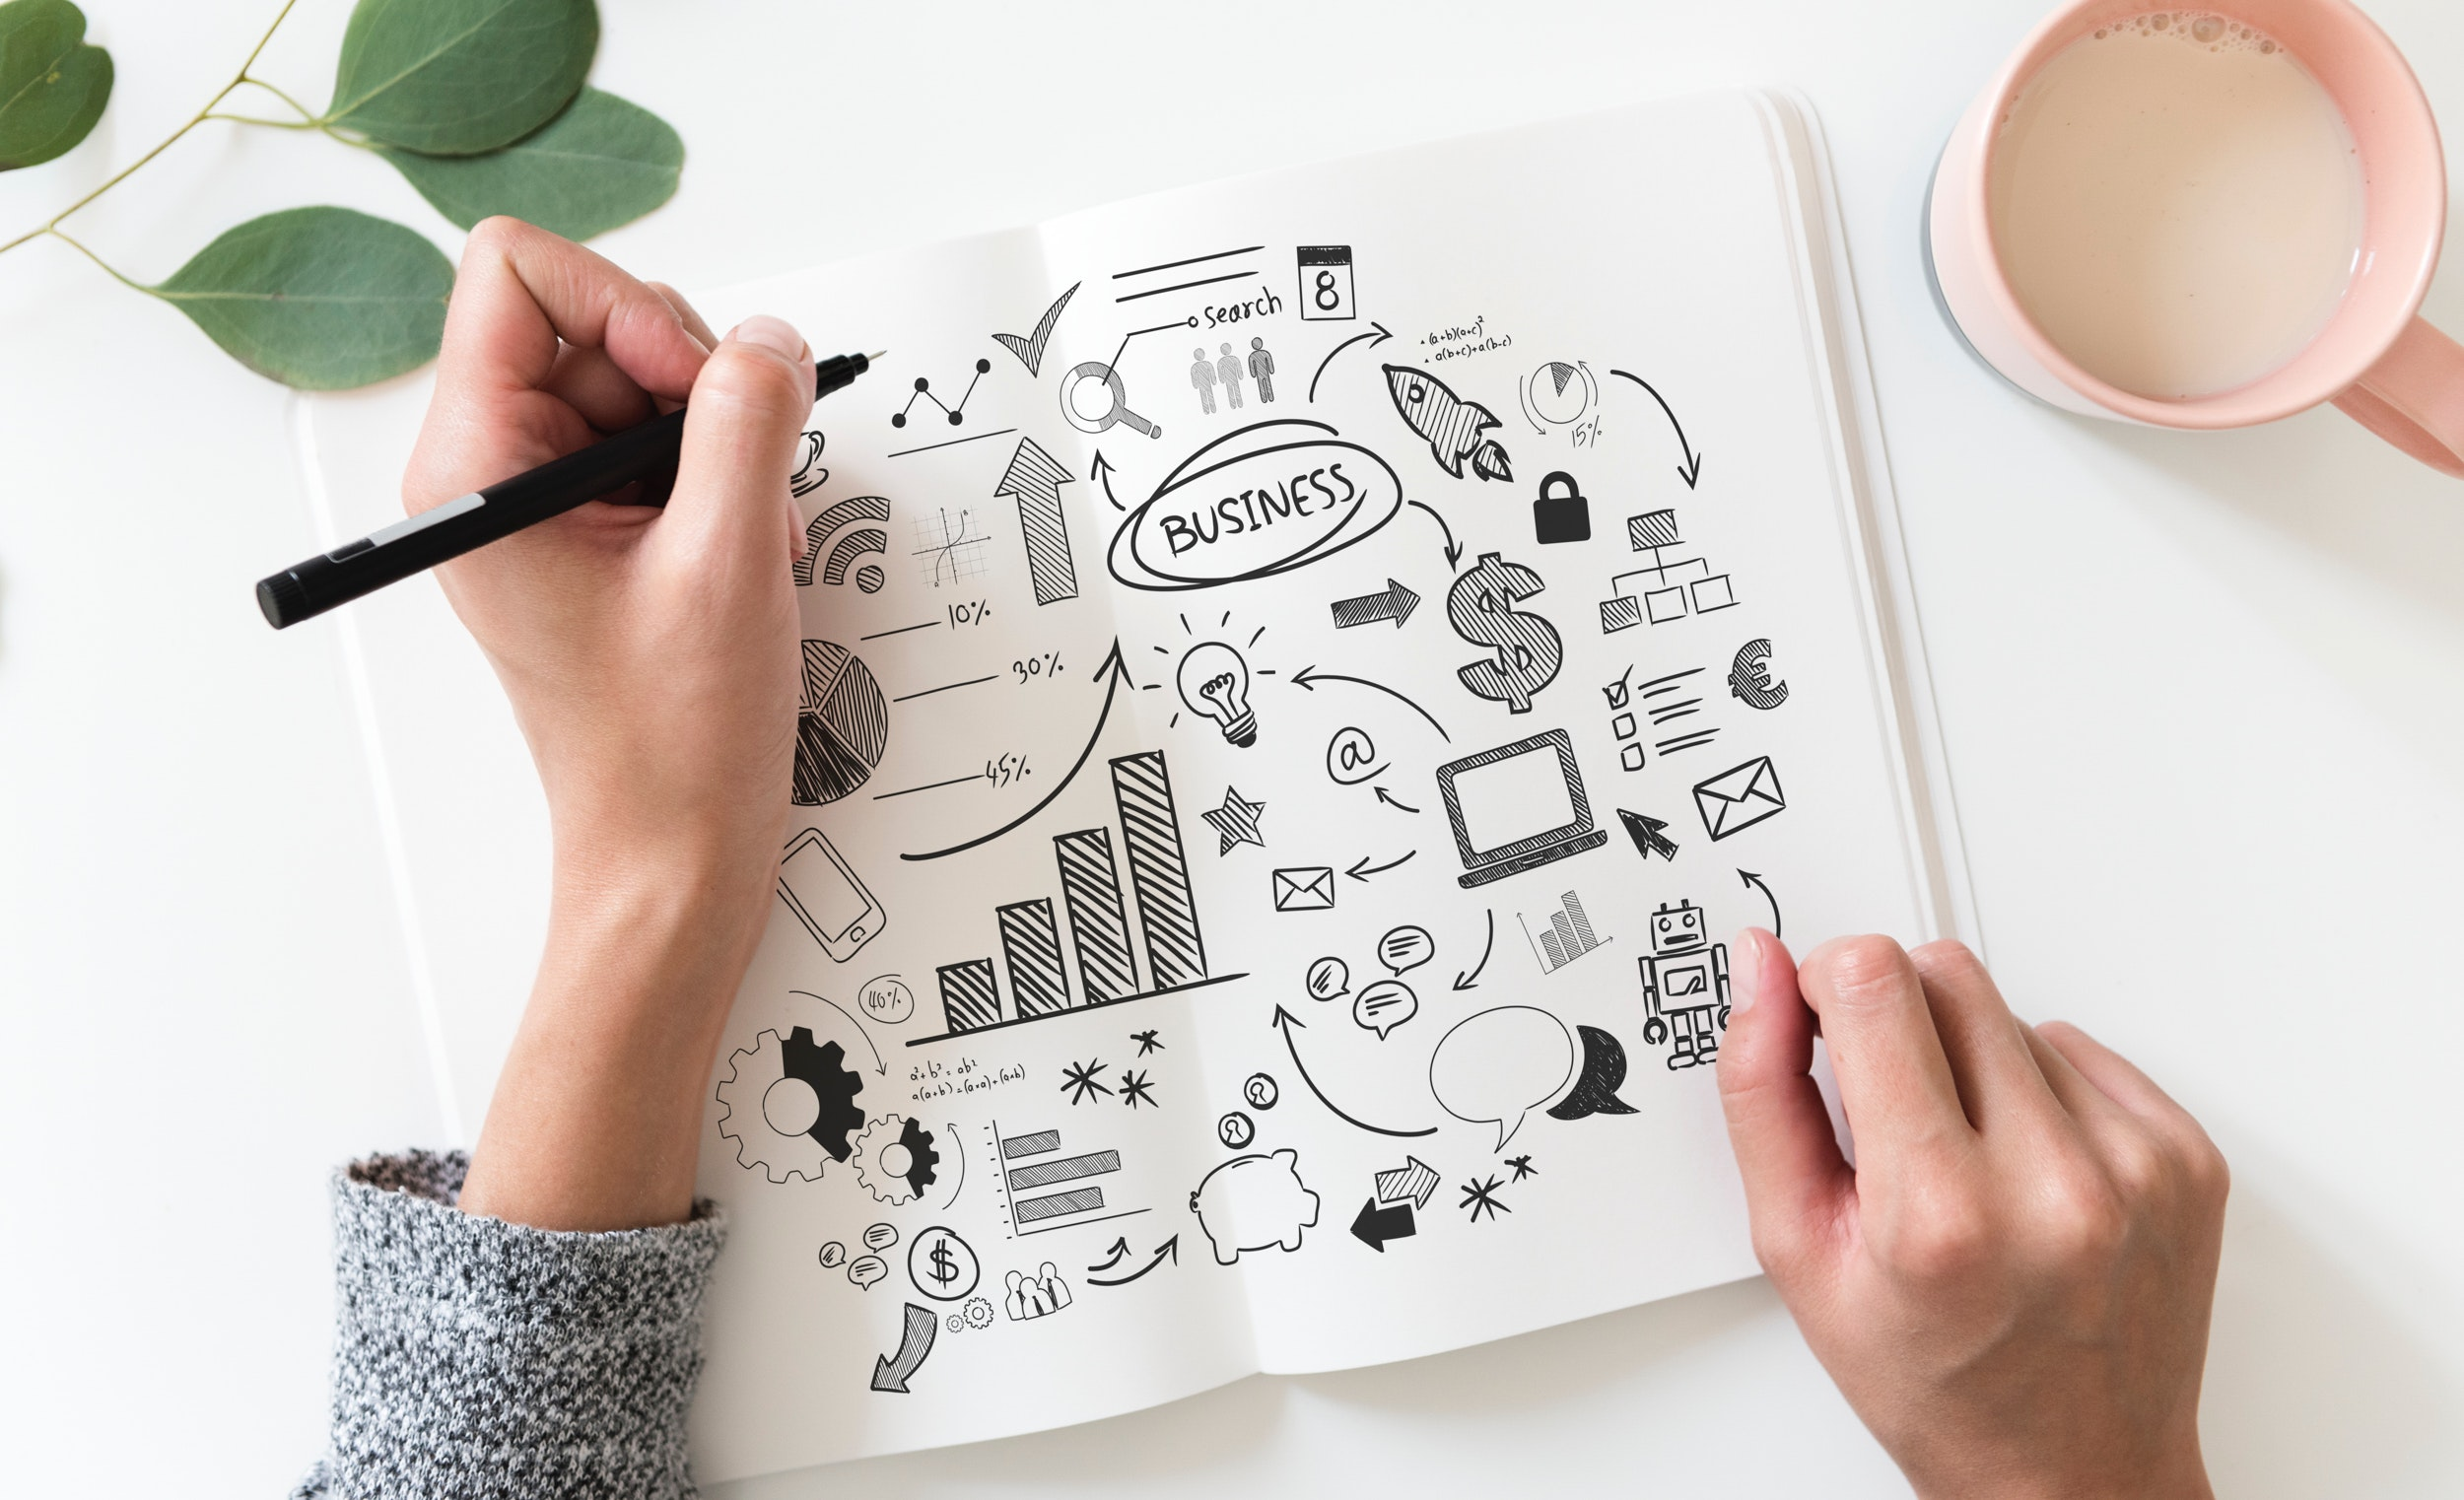 Business brainstorming image